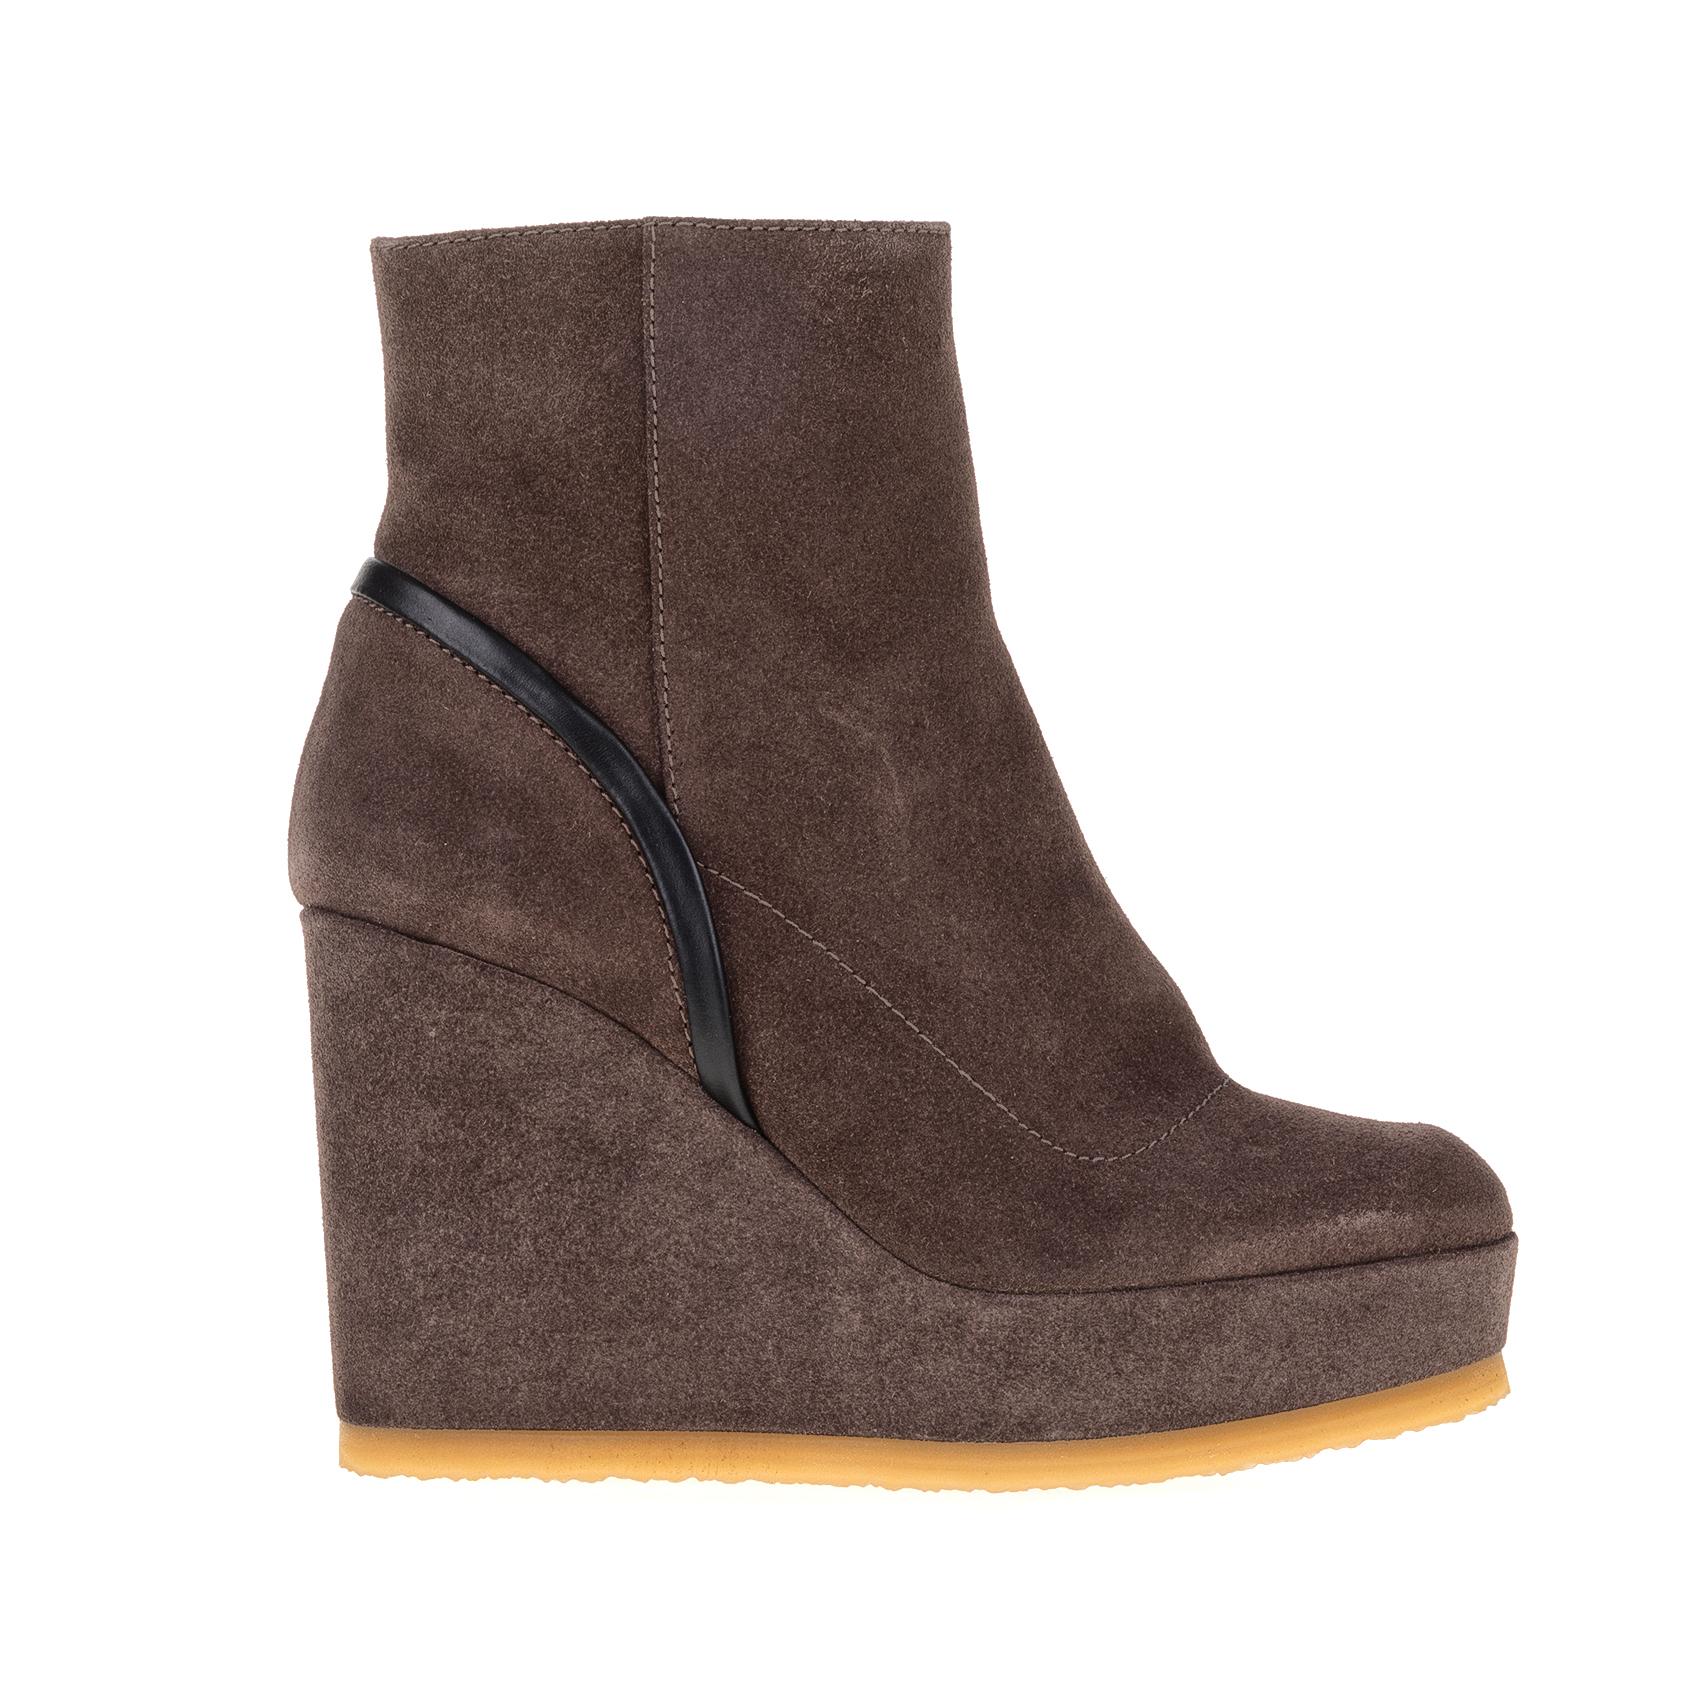 CASTANER - Γυναικεία μποτάκια CASTANER μπεζ-γκρι γυναικεία παπούτσια μπότες μποτάκια μποτάκια